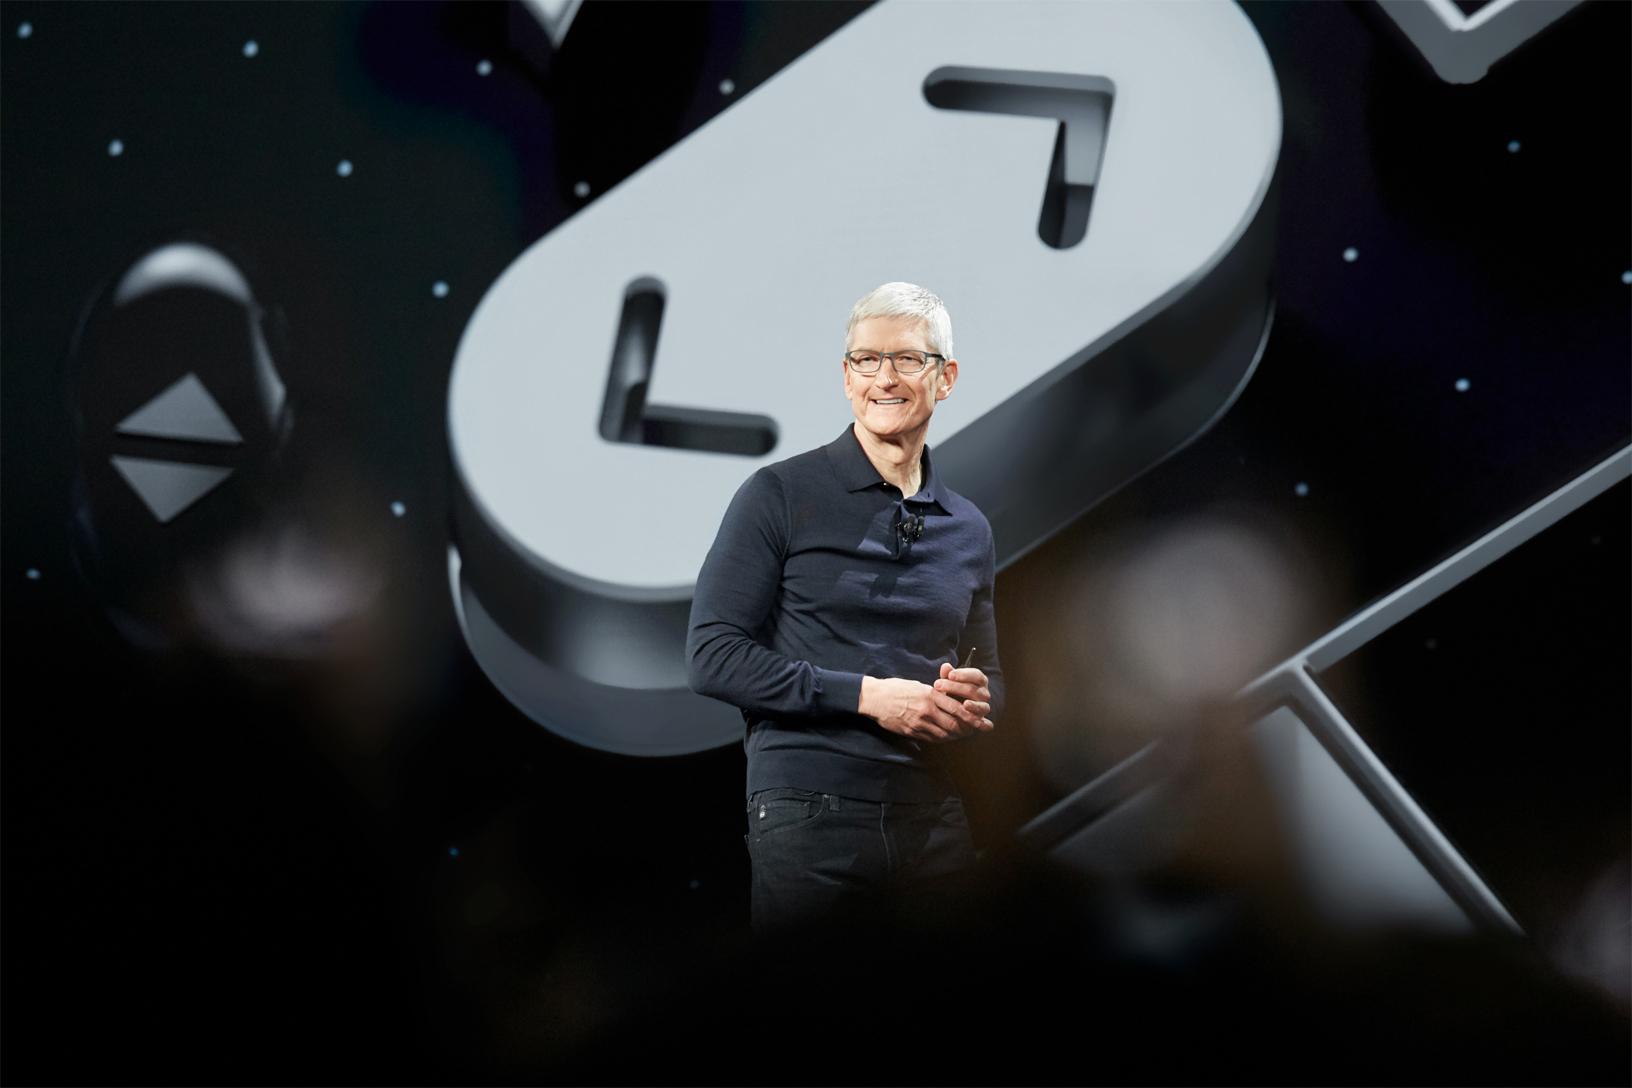 Apple WWDC 2019 date svelate: è dal 3-7 giugno a San Jose